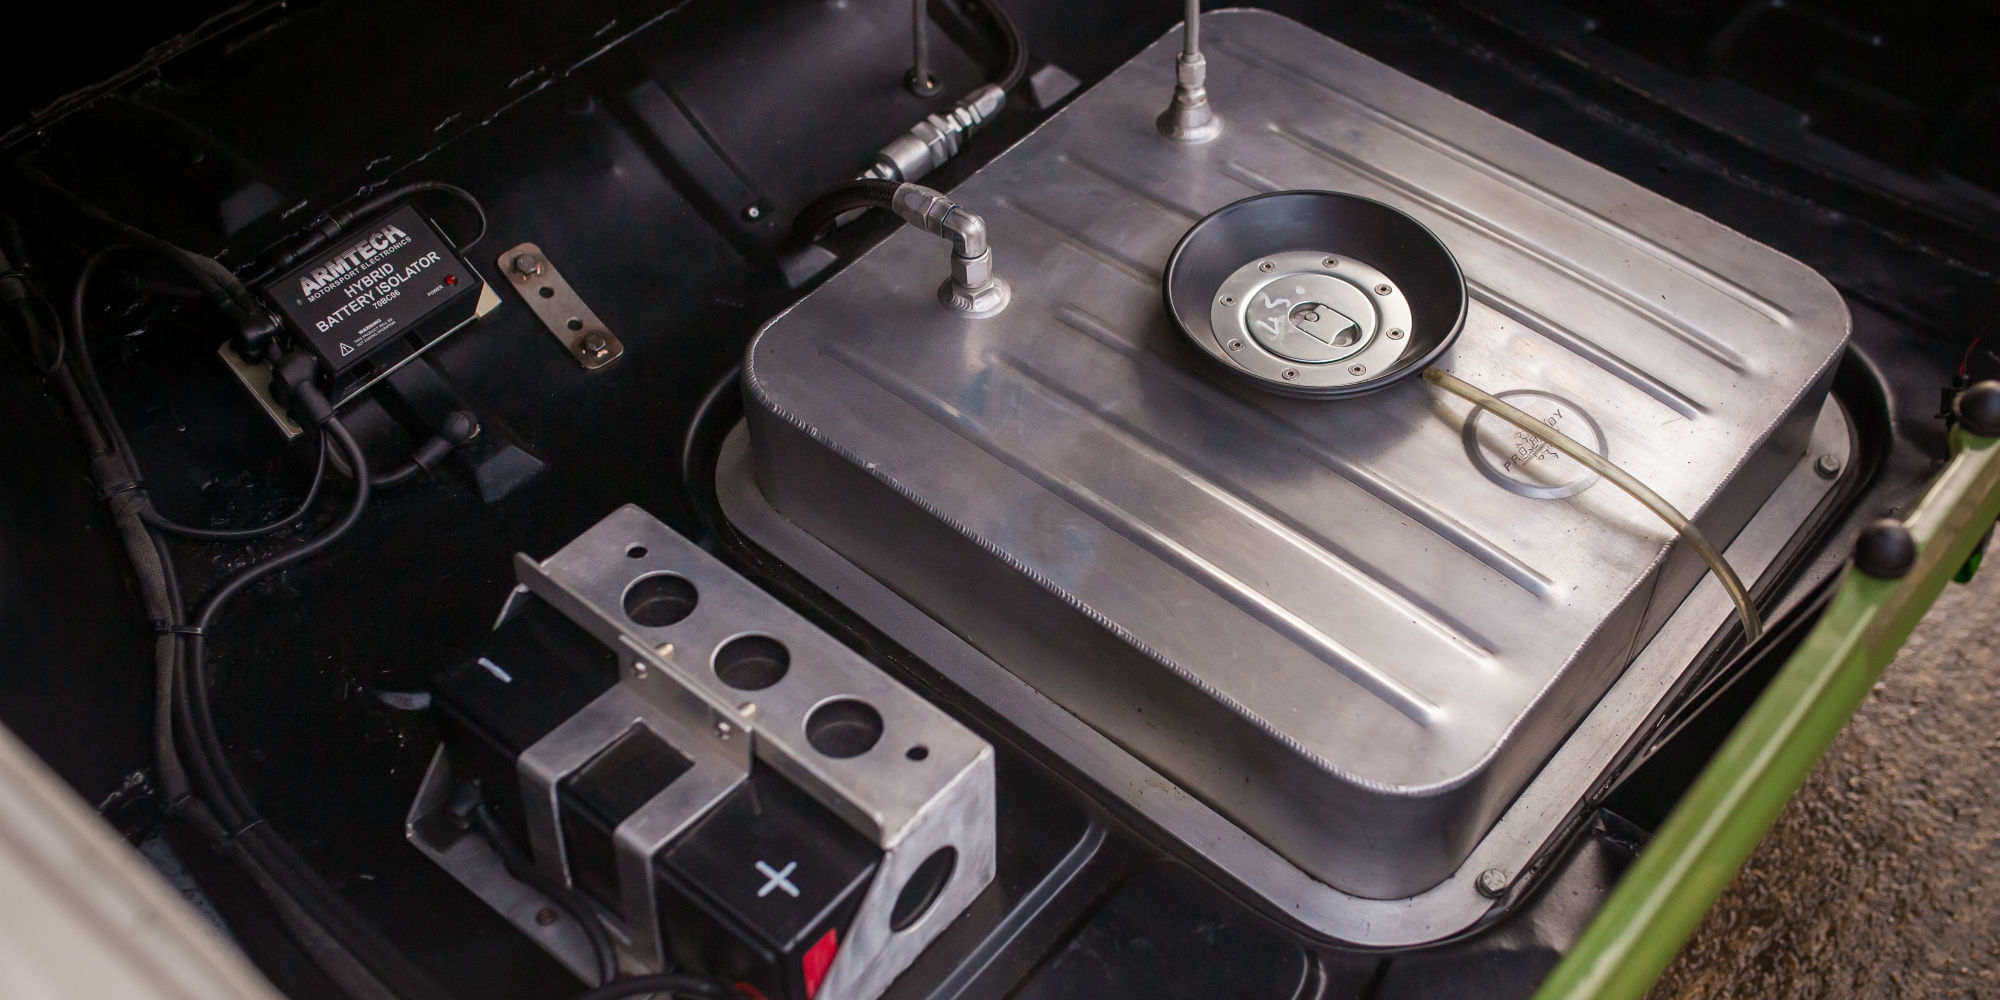 The Leo Voyazides / Simon Hadfield Lotus Cortina Mk1